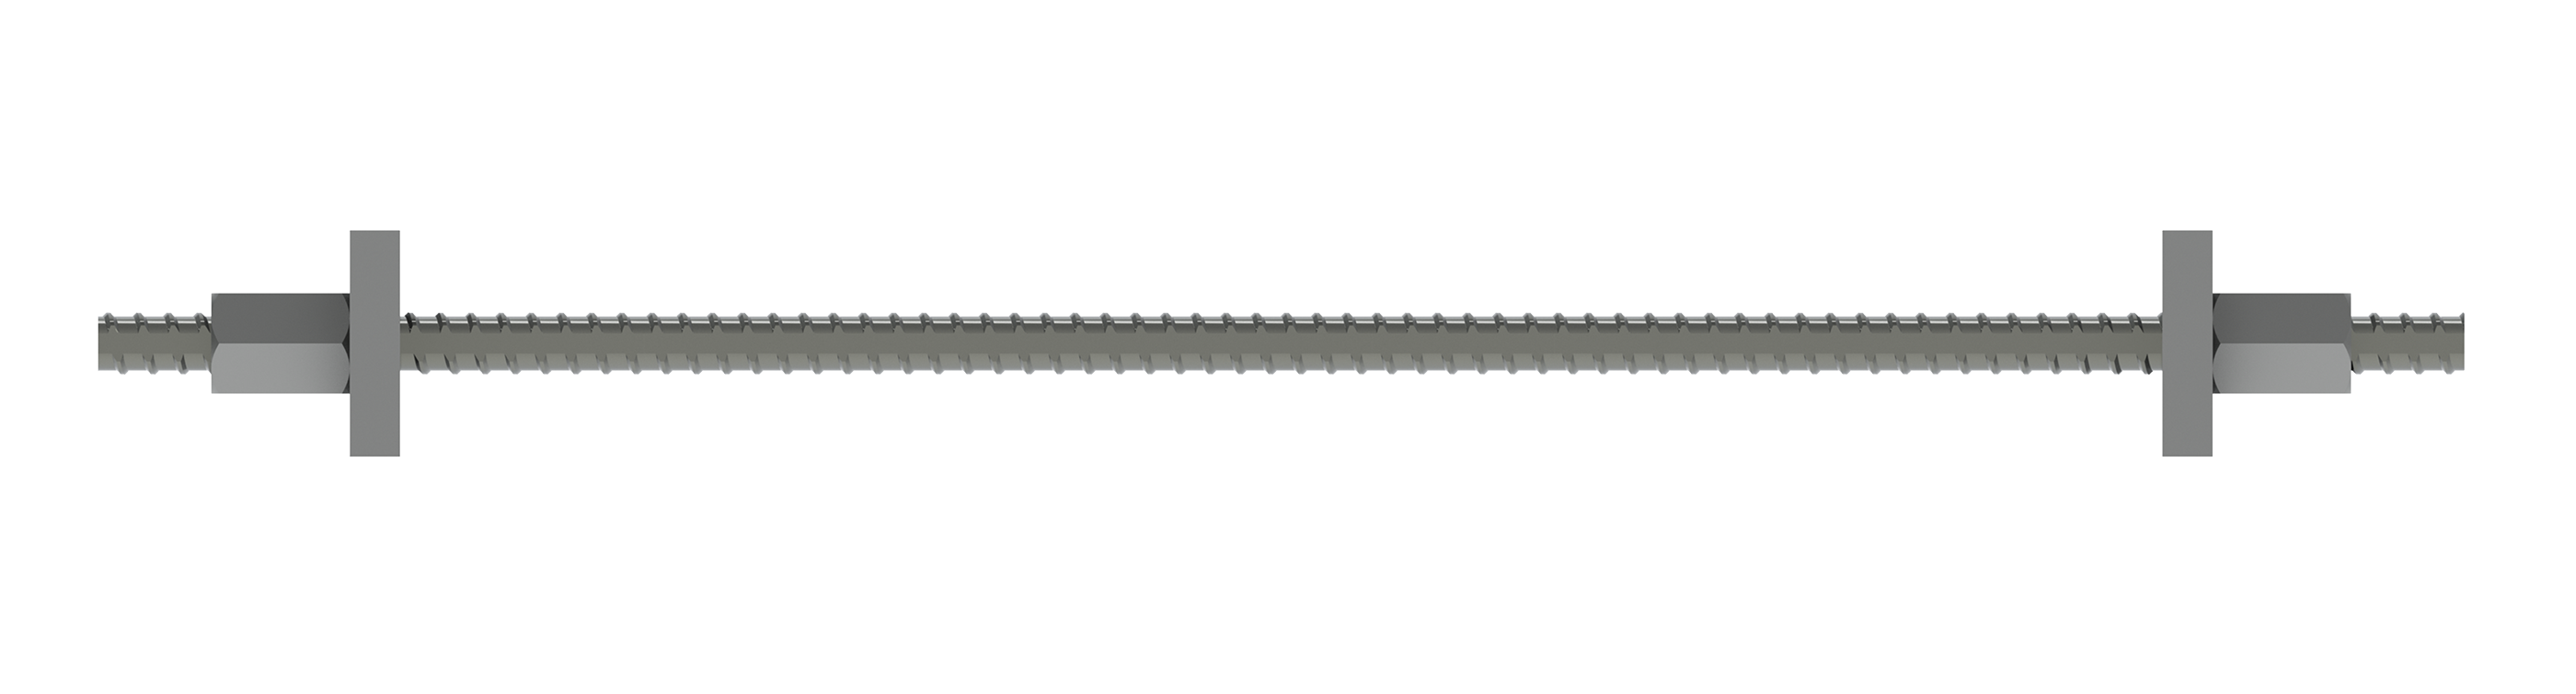 Post Tensioning Bar Systems | Fully Threaded bar | Bridge